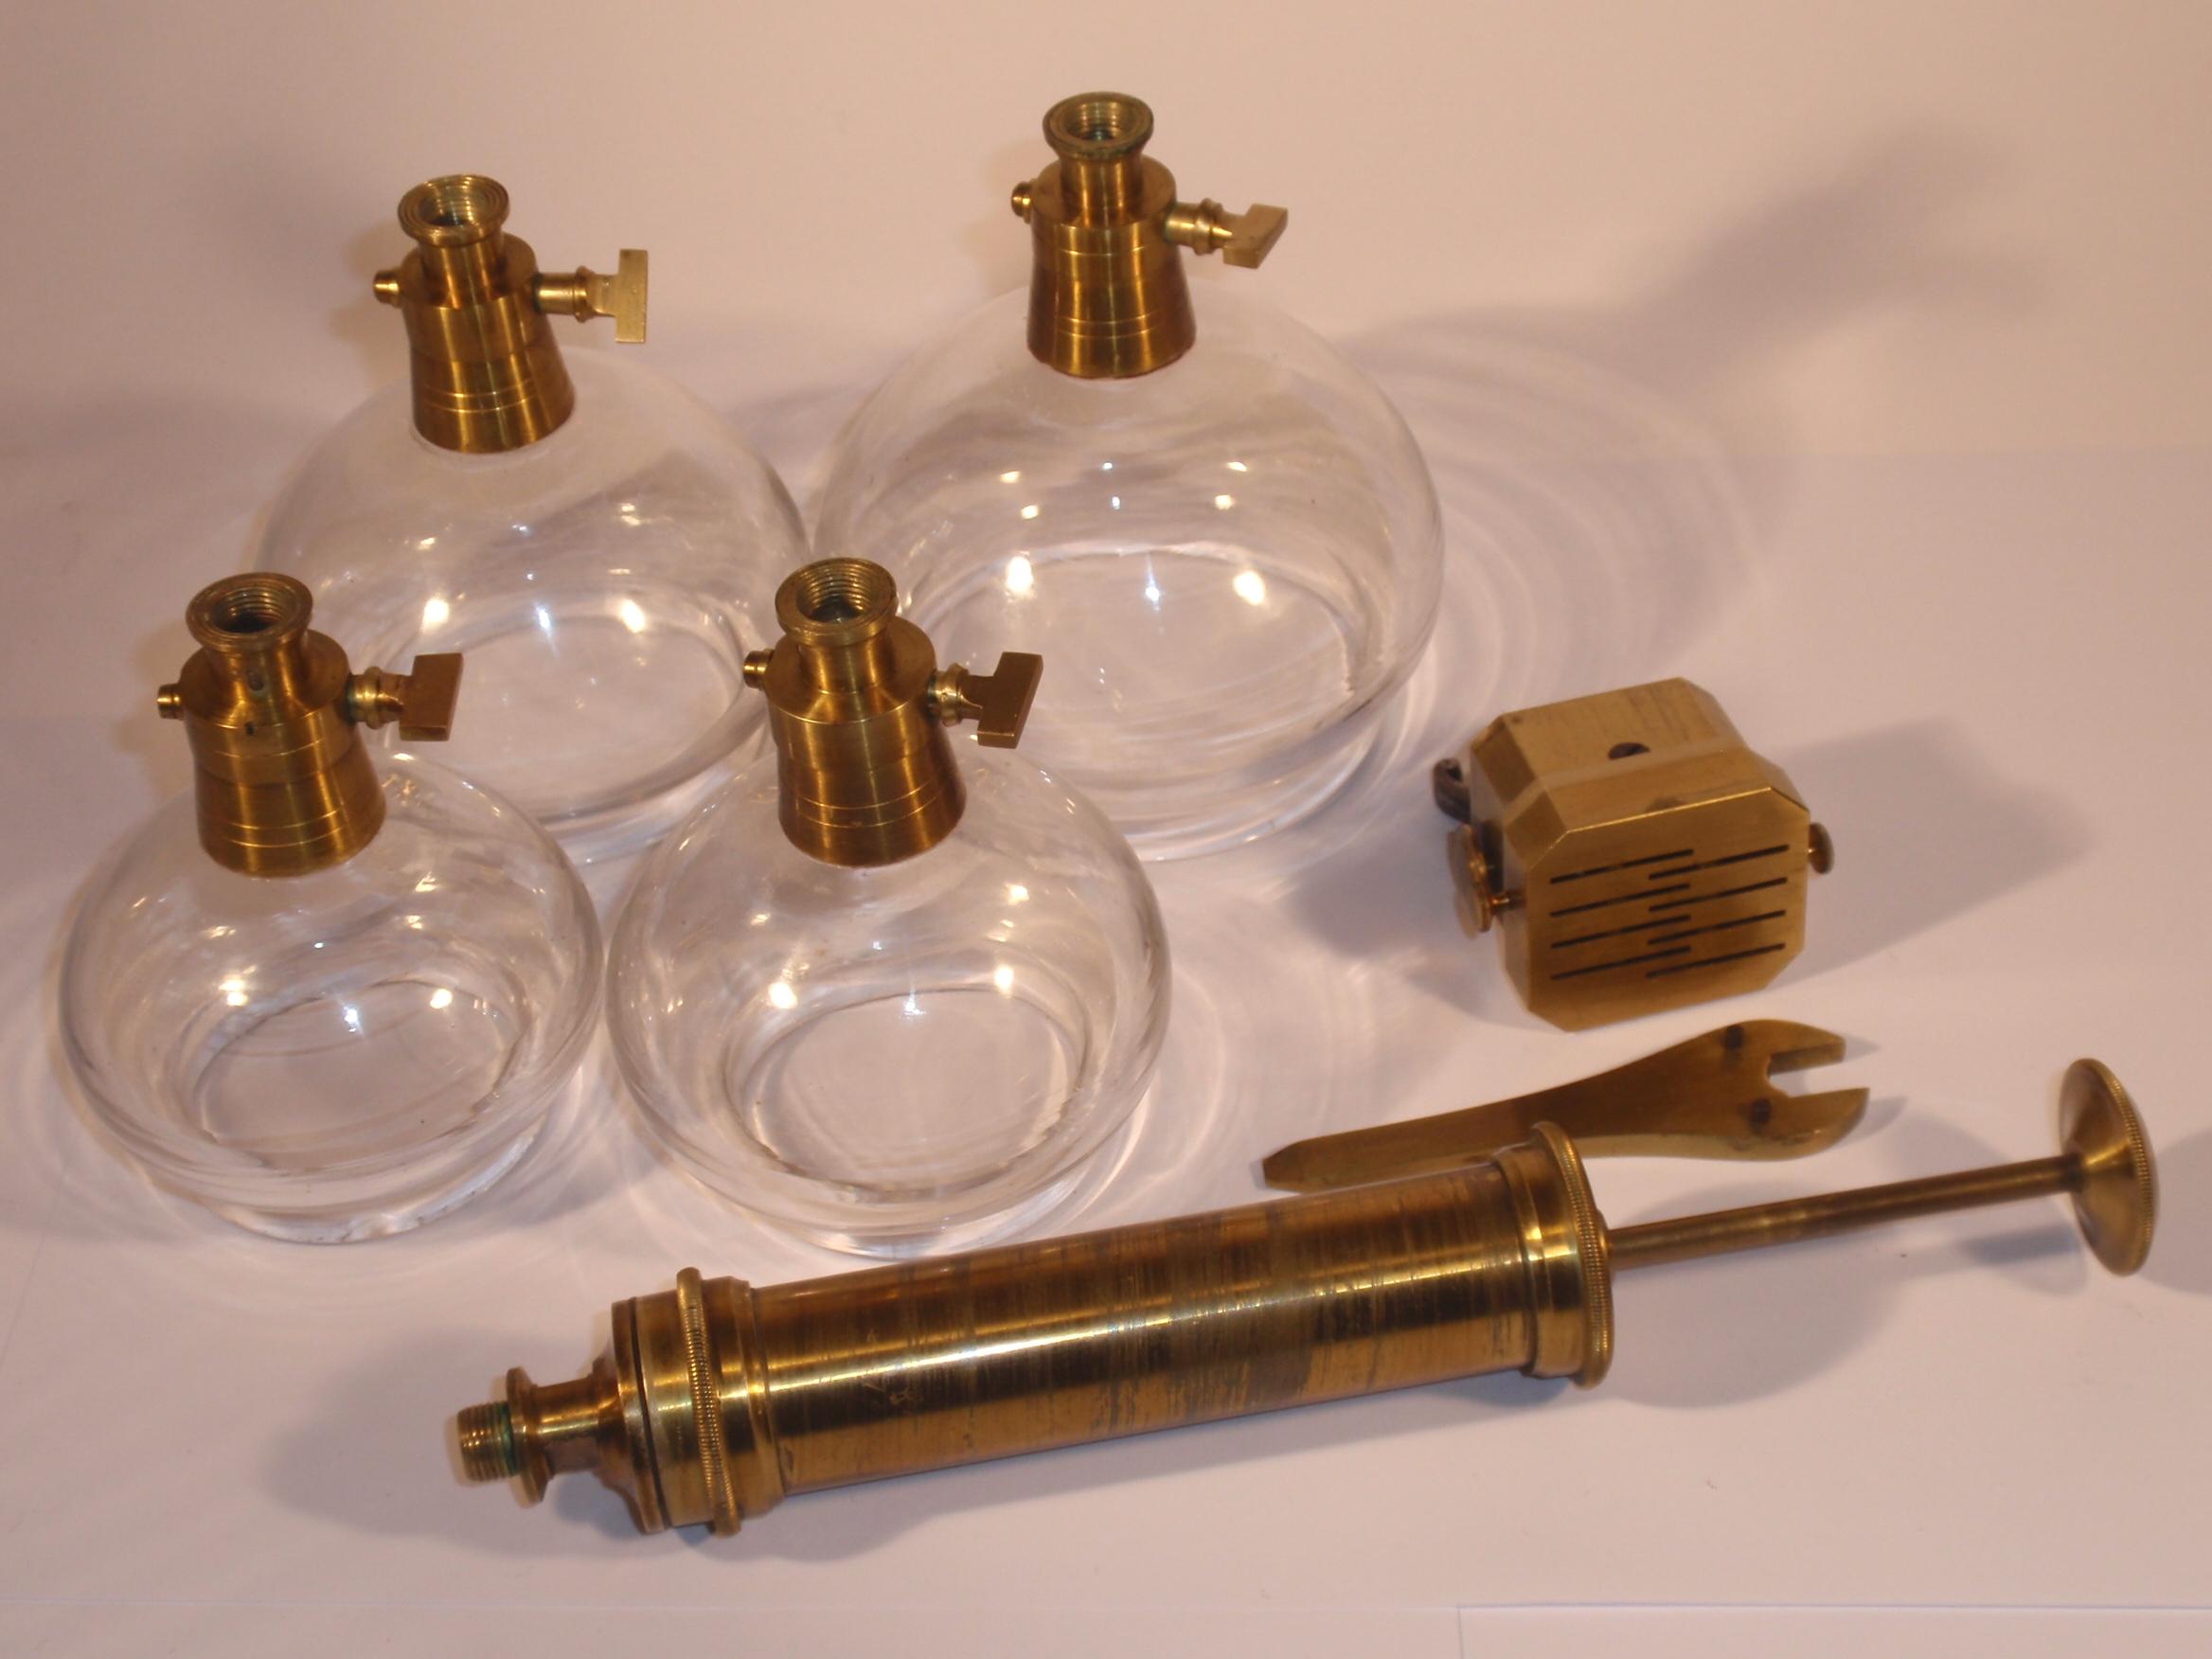 Fine Cupping Set, ca. 1820 – 1860